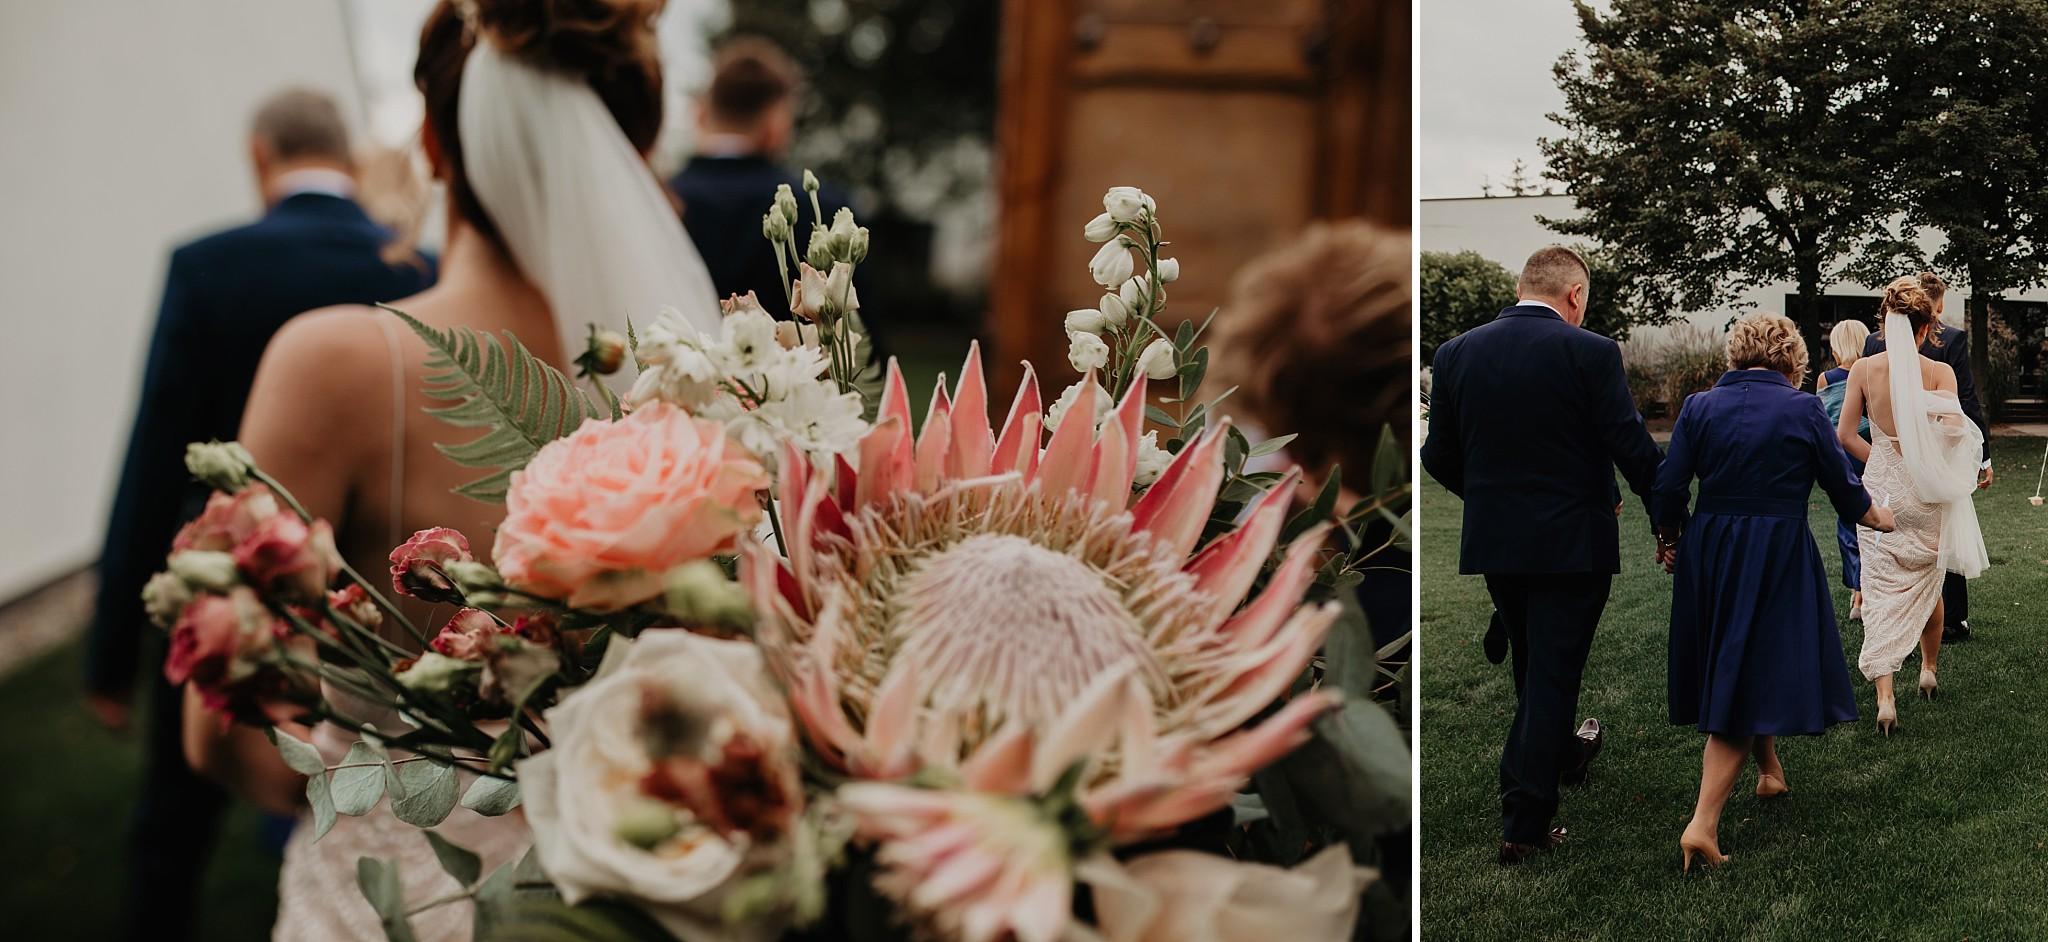 fotograf poznan wesele dobra truskawka piekne wesele pod poznaniem wesele w dobrej truskawce piekna para mloda slub marzen slub koronawirus slub listopad wesele koronawirus 111